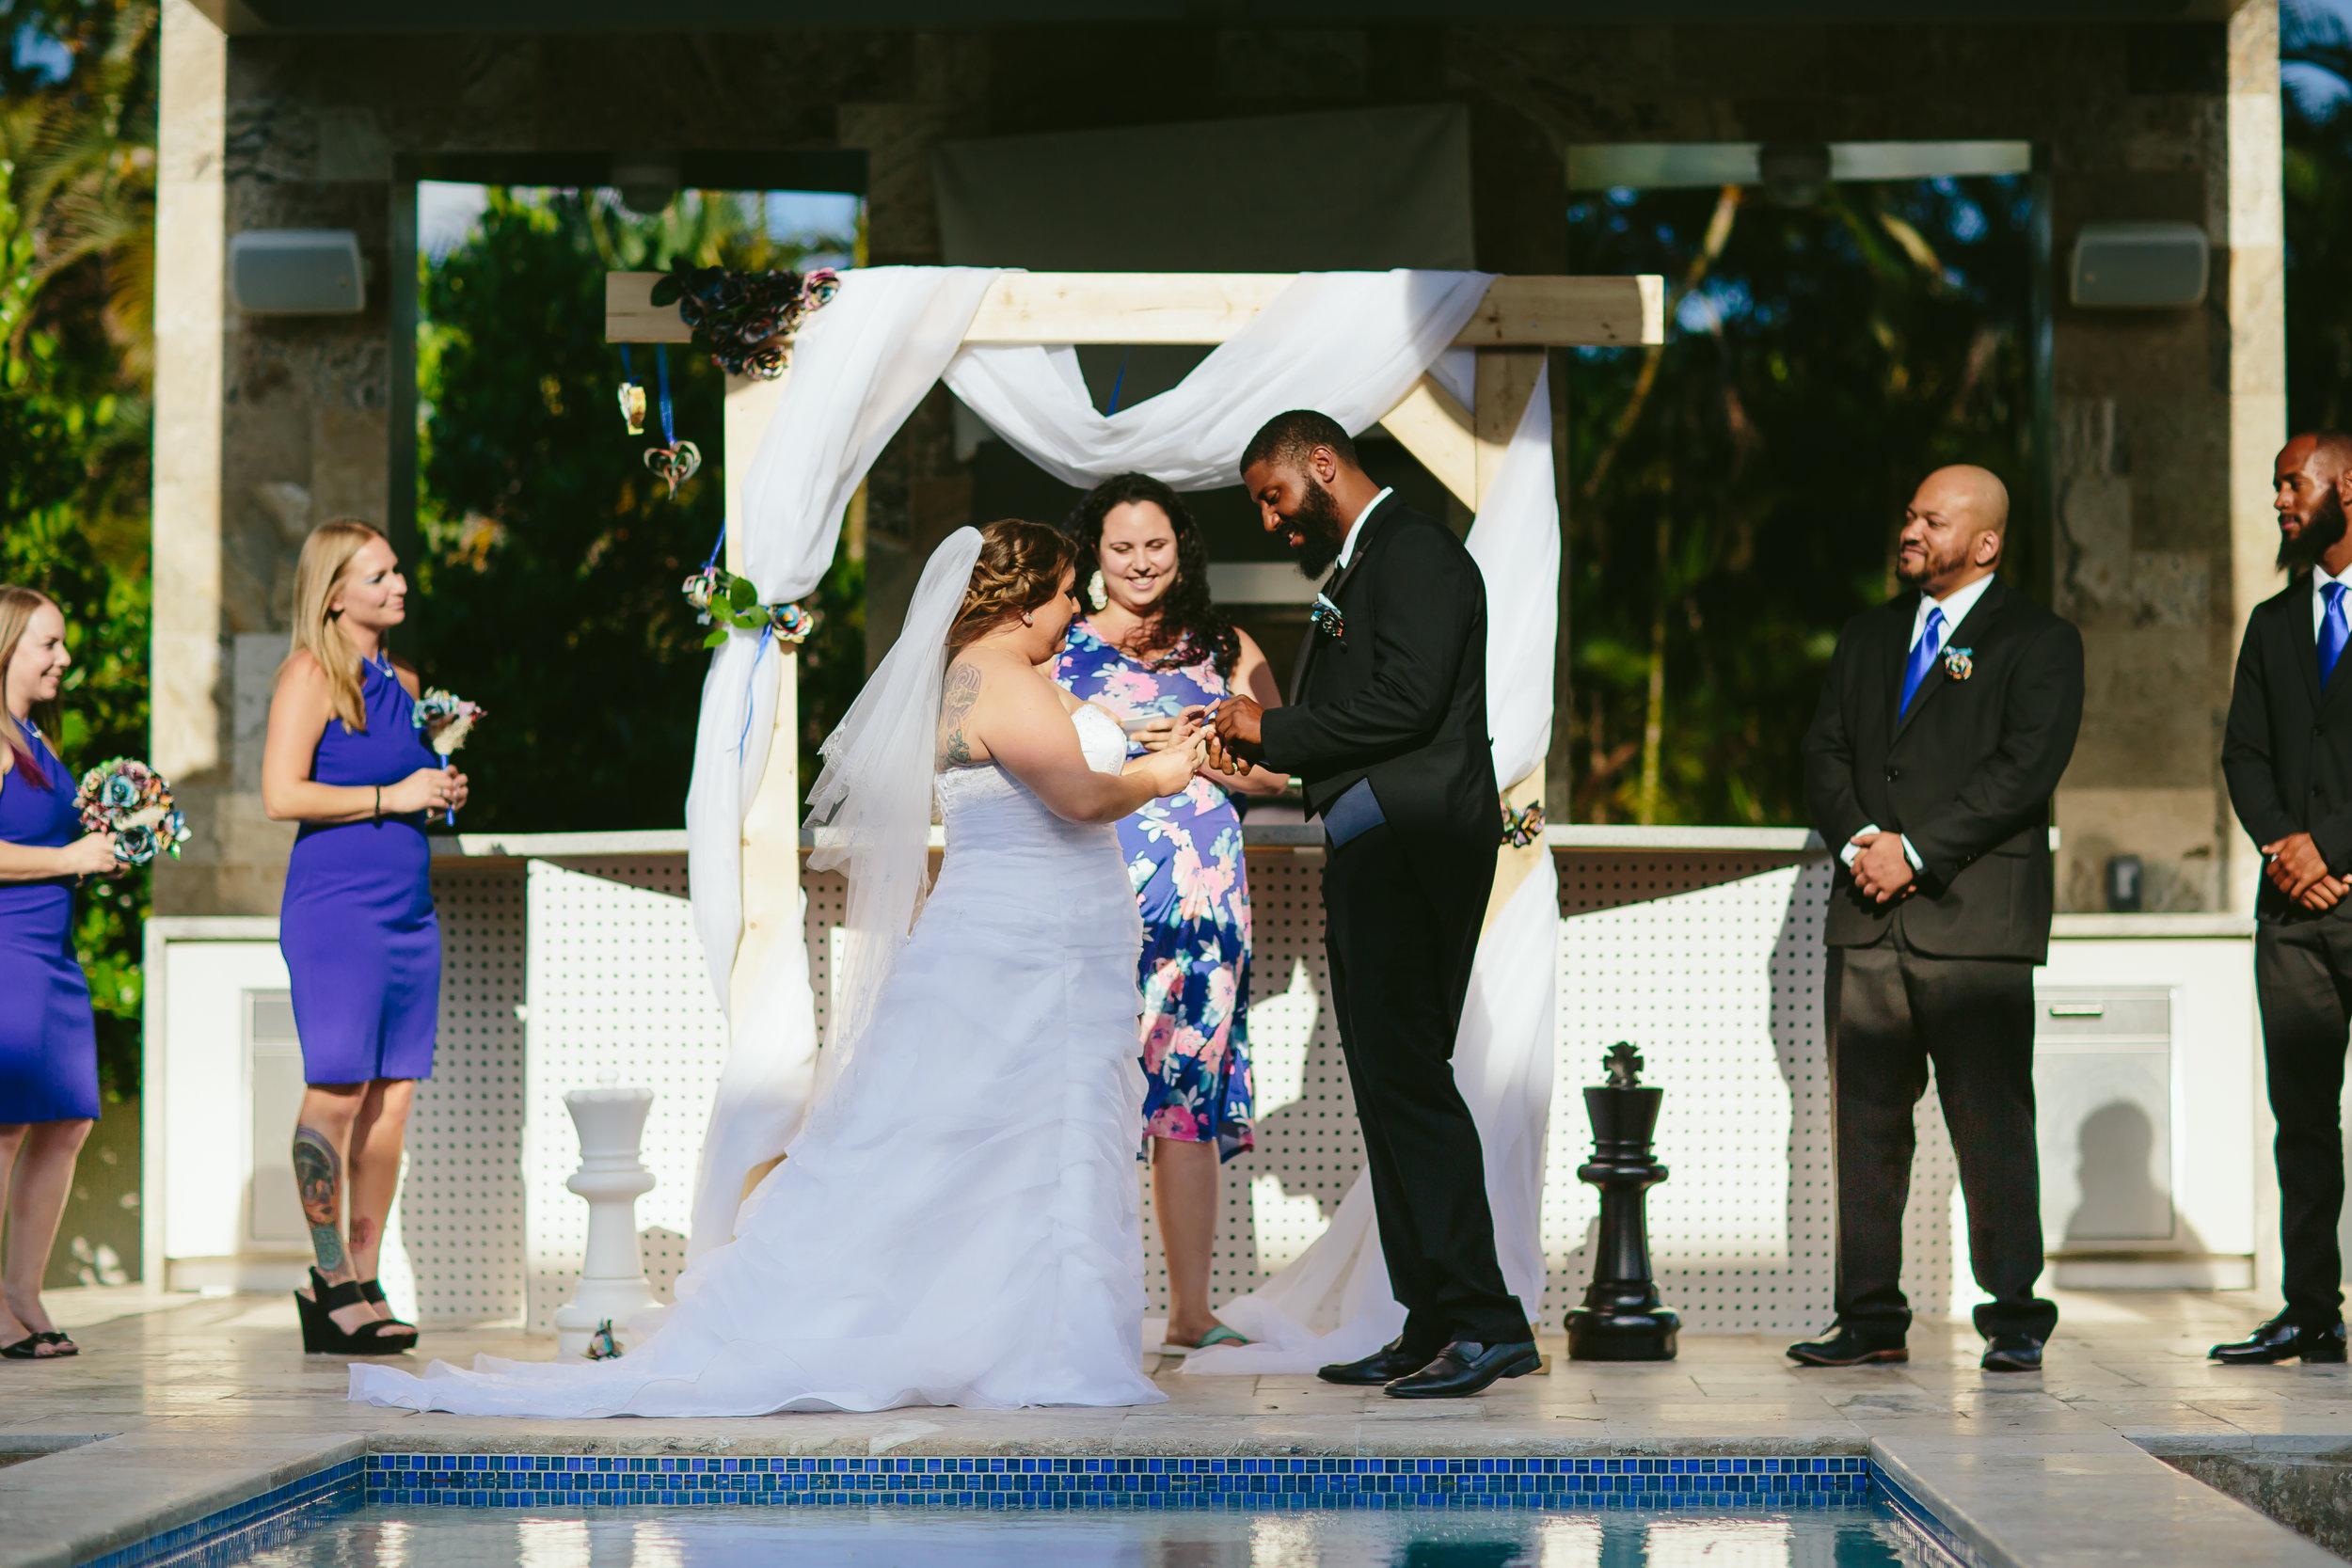 backyard-wedding-ceremony-pool-intimate-tiny-house-photo-florida-weddings.jpg